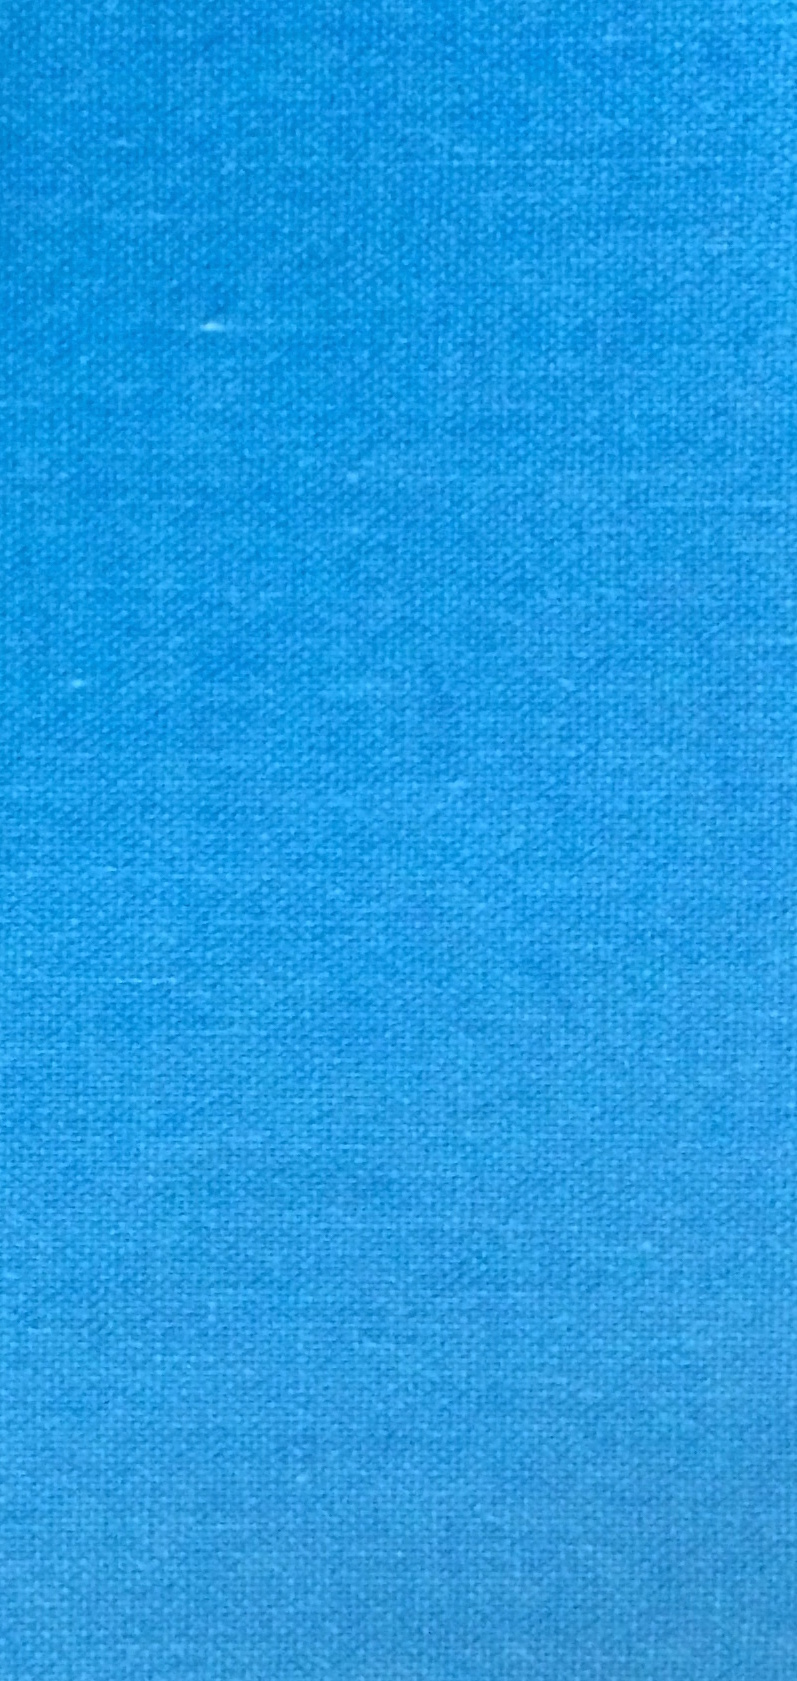 Arrestox Sky Blue Linen